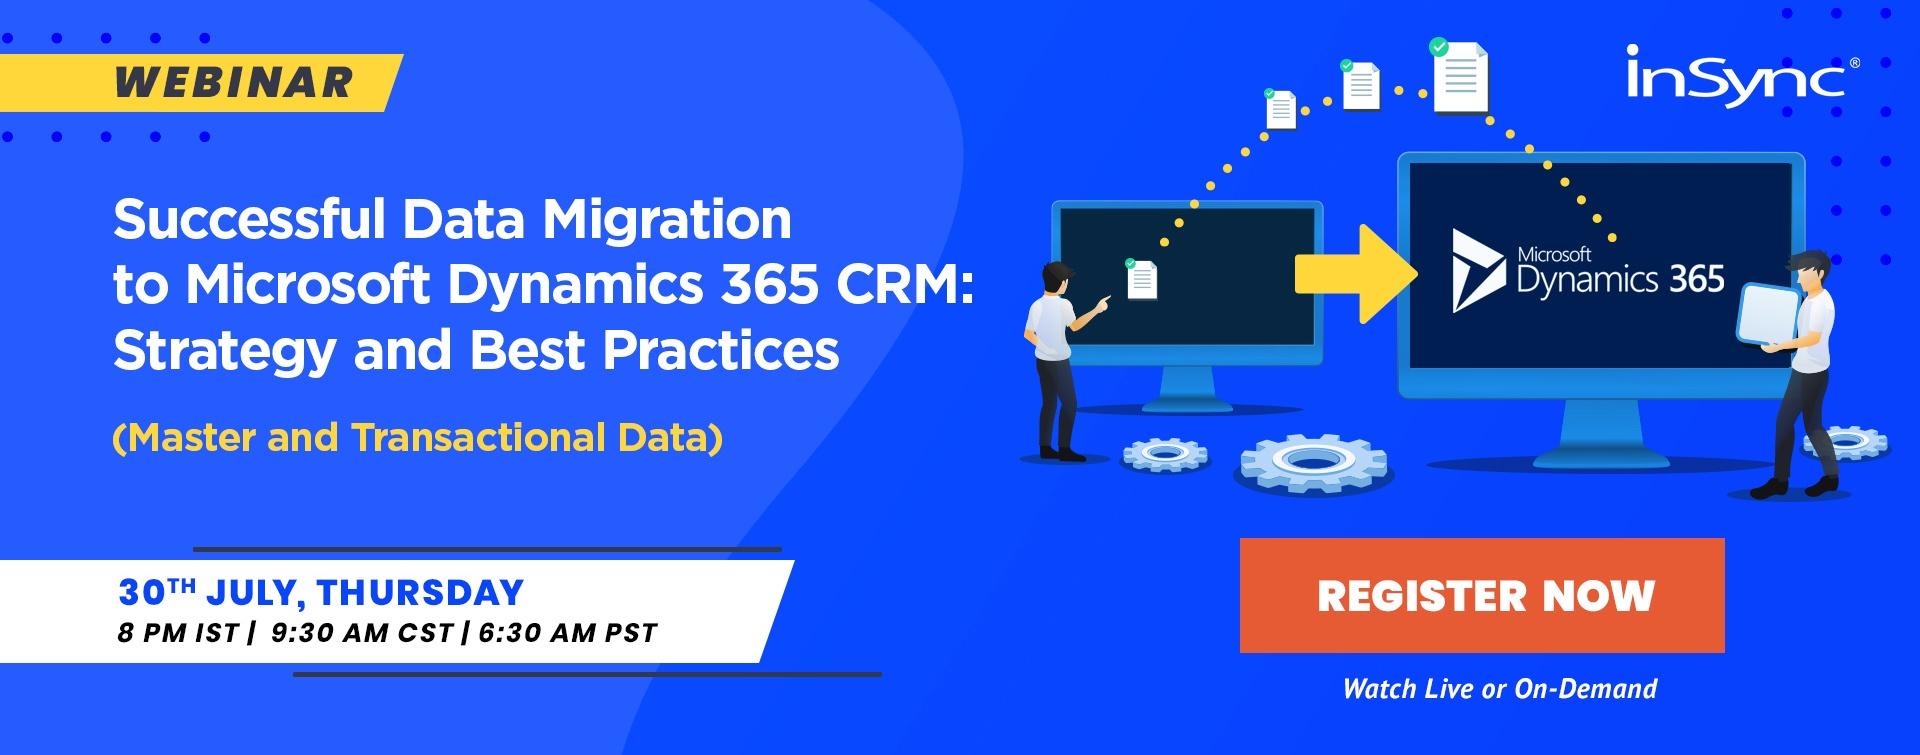 dynamics-365-data-migration-webinar-insync-cta